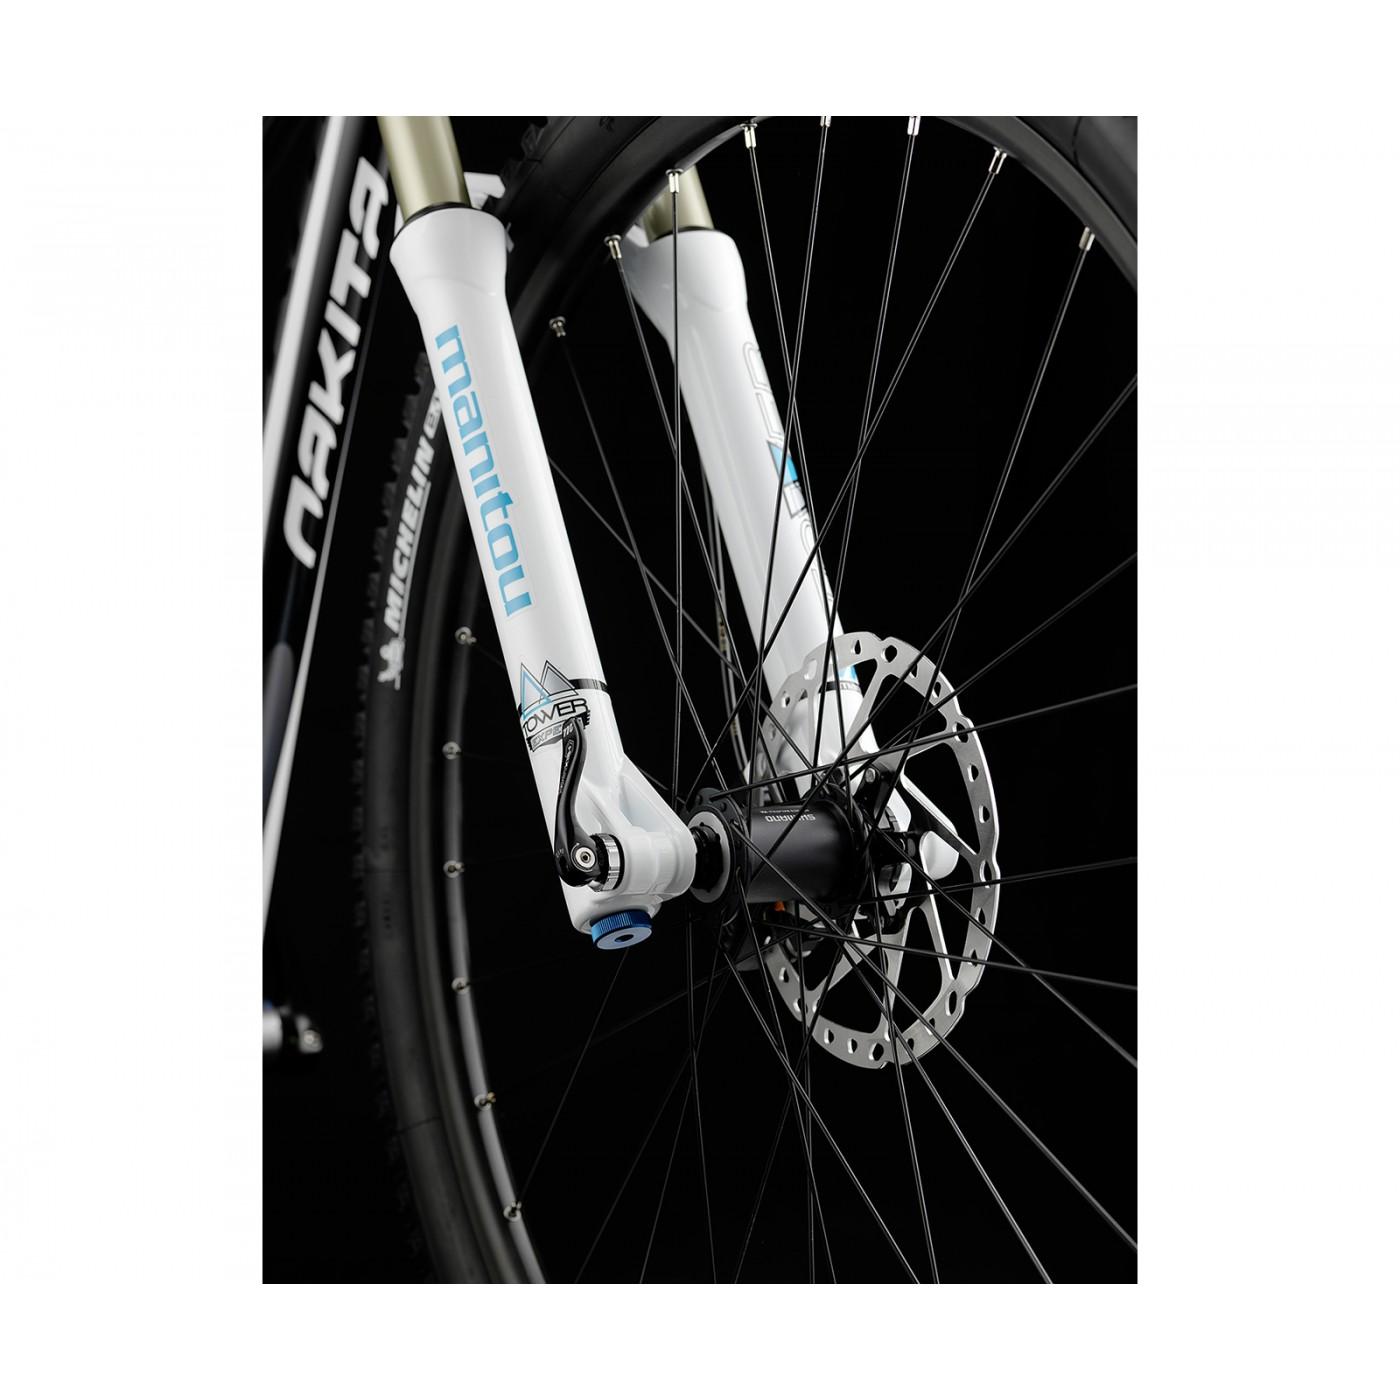 Nakita Evo 9.5 Big | Bike | Mountain Bike | SportConcept View Image